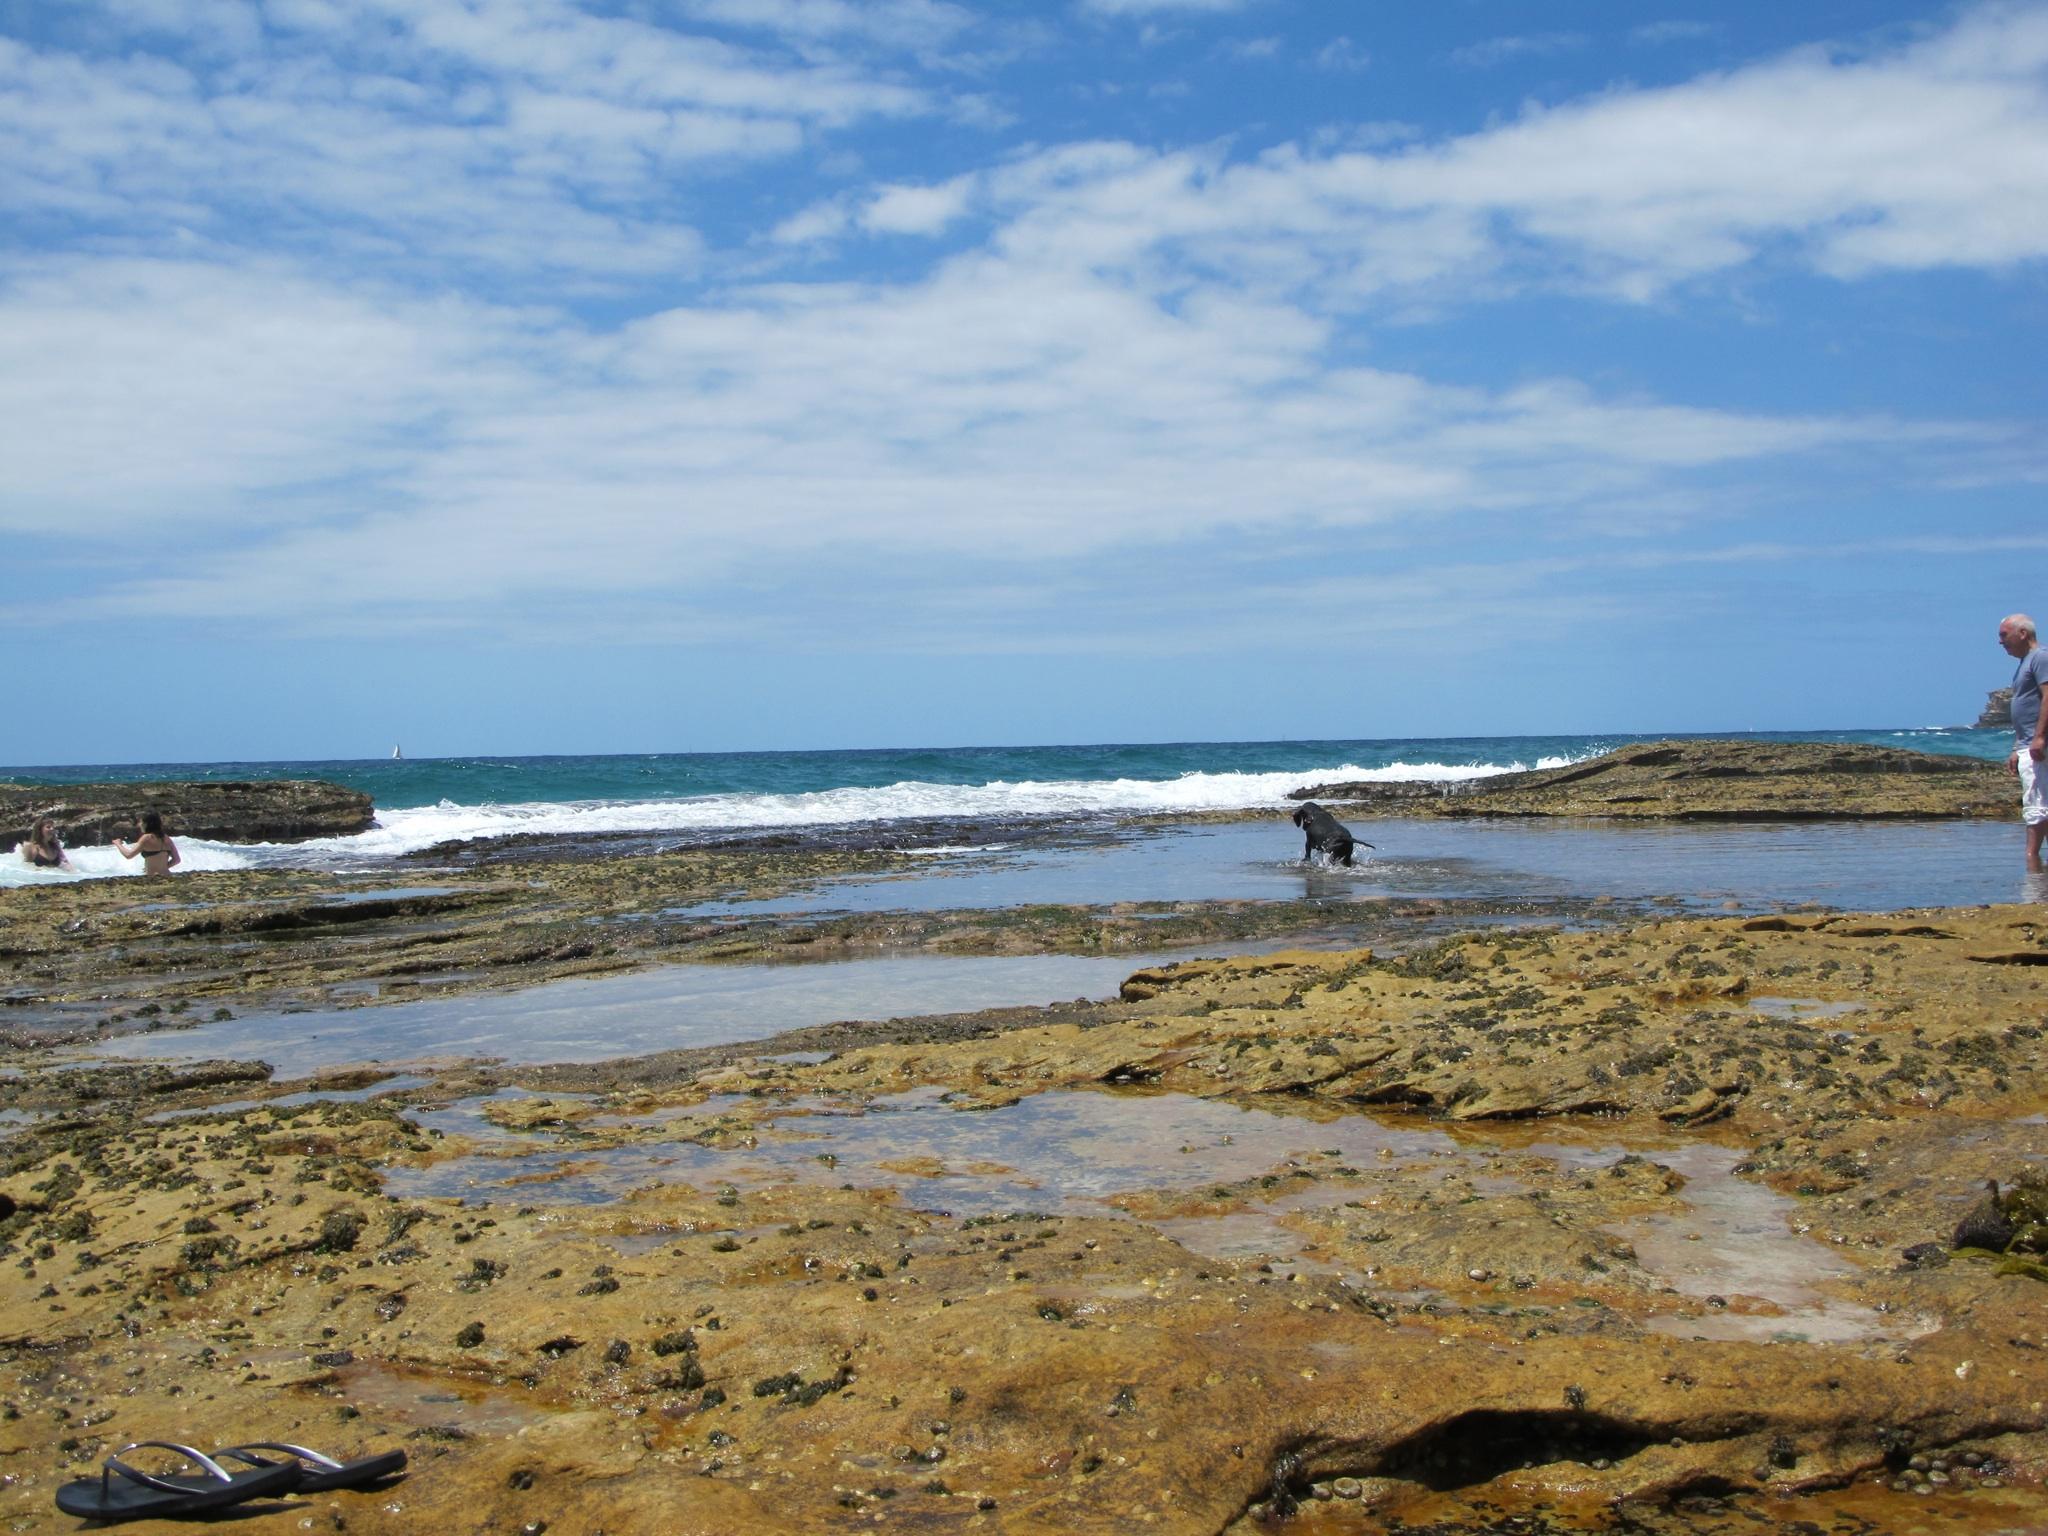 rock-pools-sydney-australia